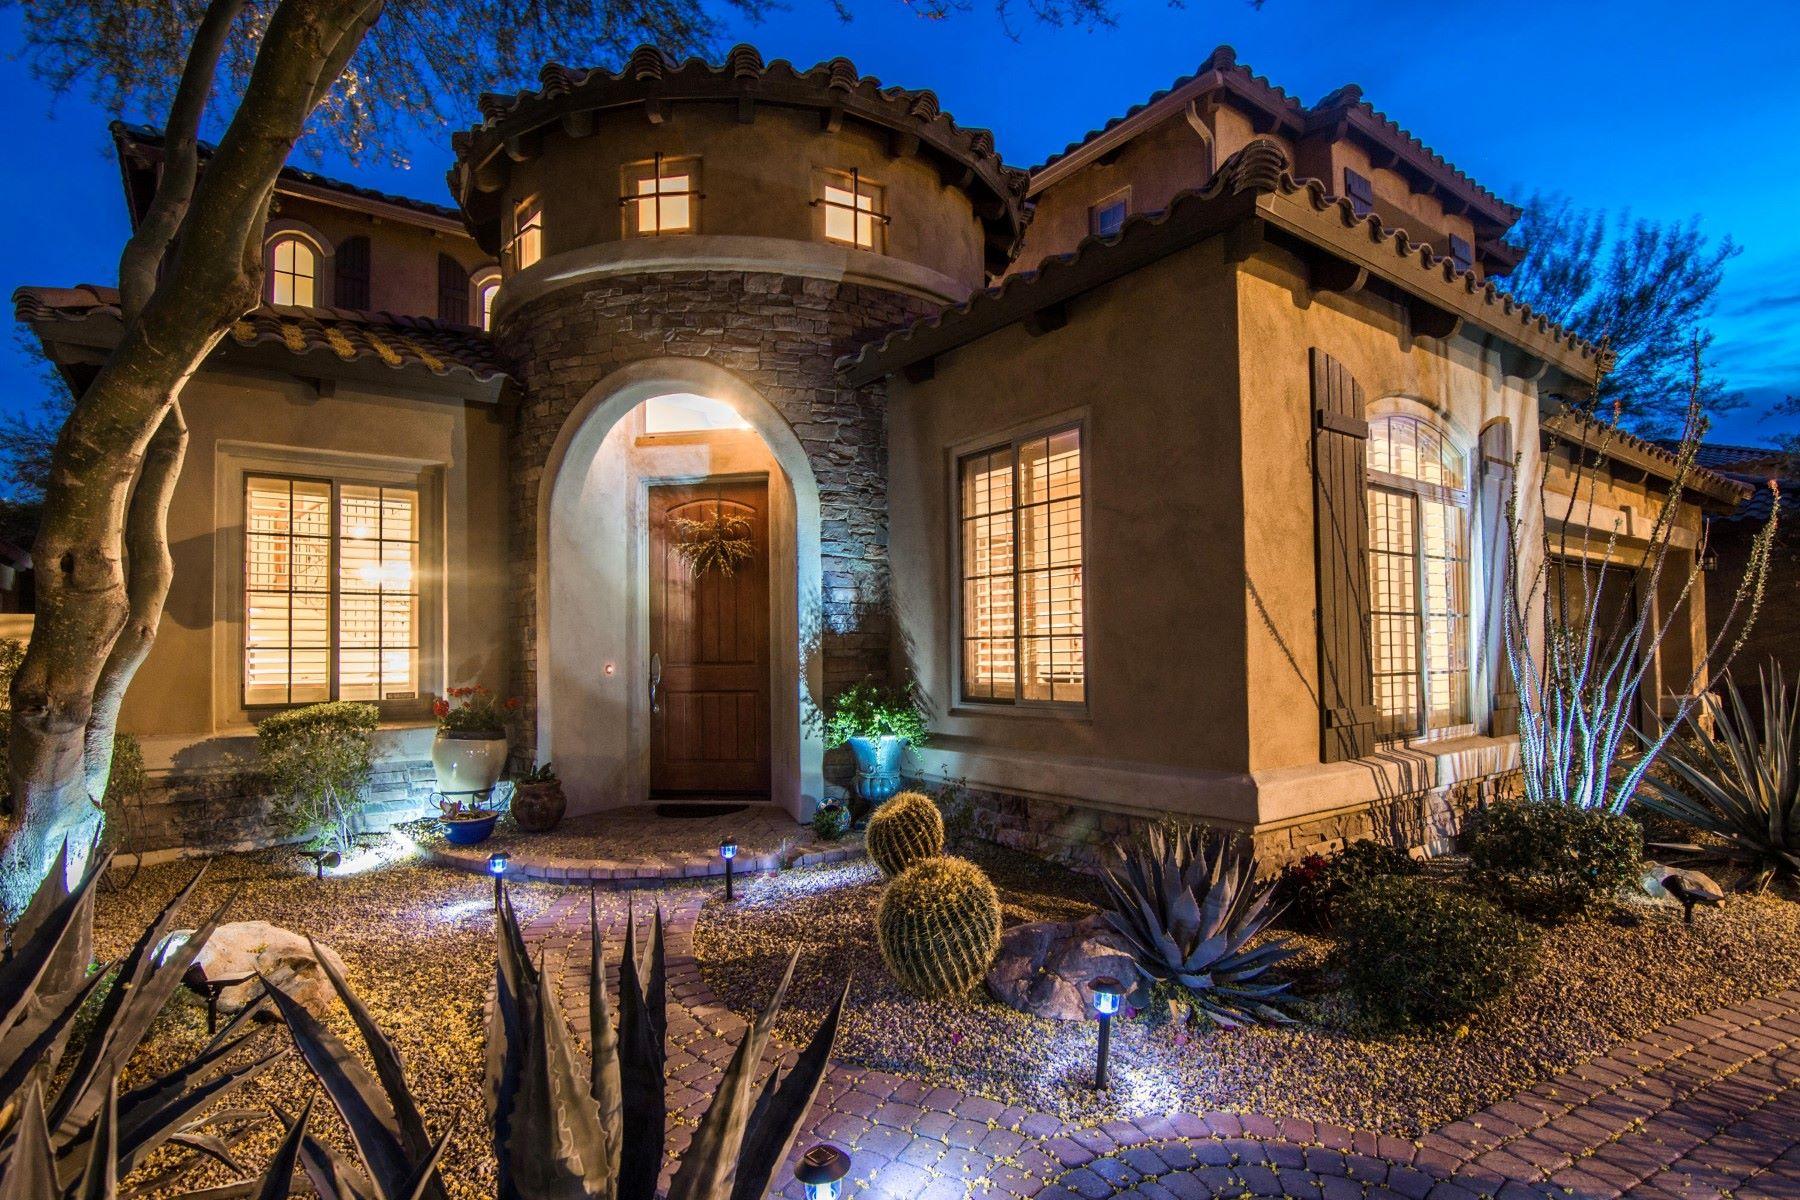 Casa Unifamiliar por un Venta en Perfect home in the coveted Aviano at Desert Ridge 3837 E Patrick Ln Phoenix, Arizona, 85050 Estados Unidos